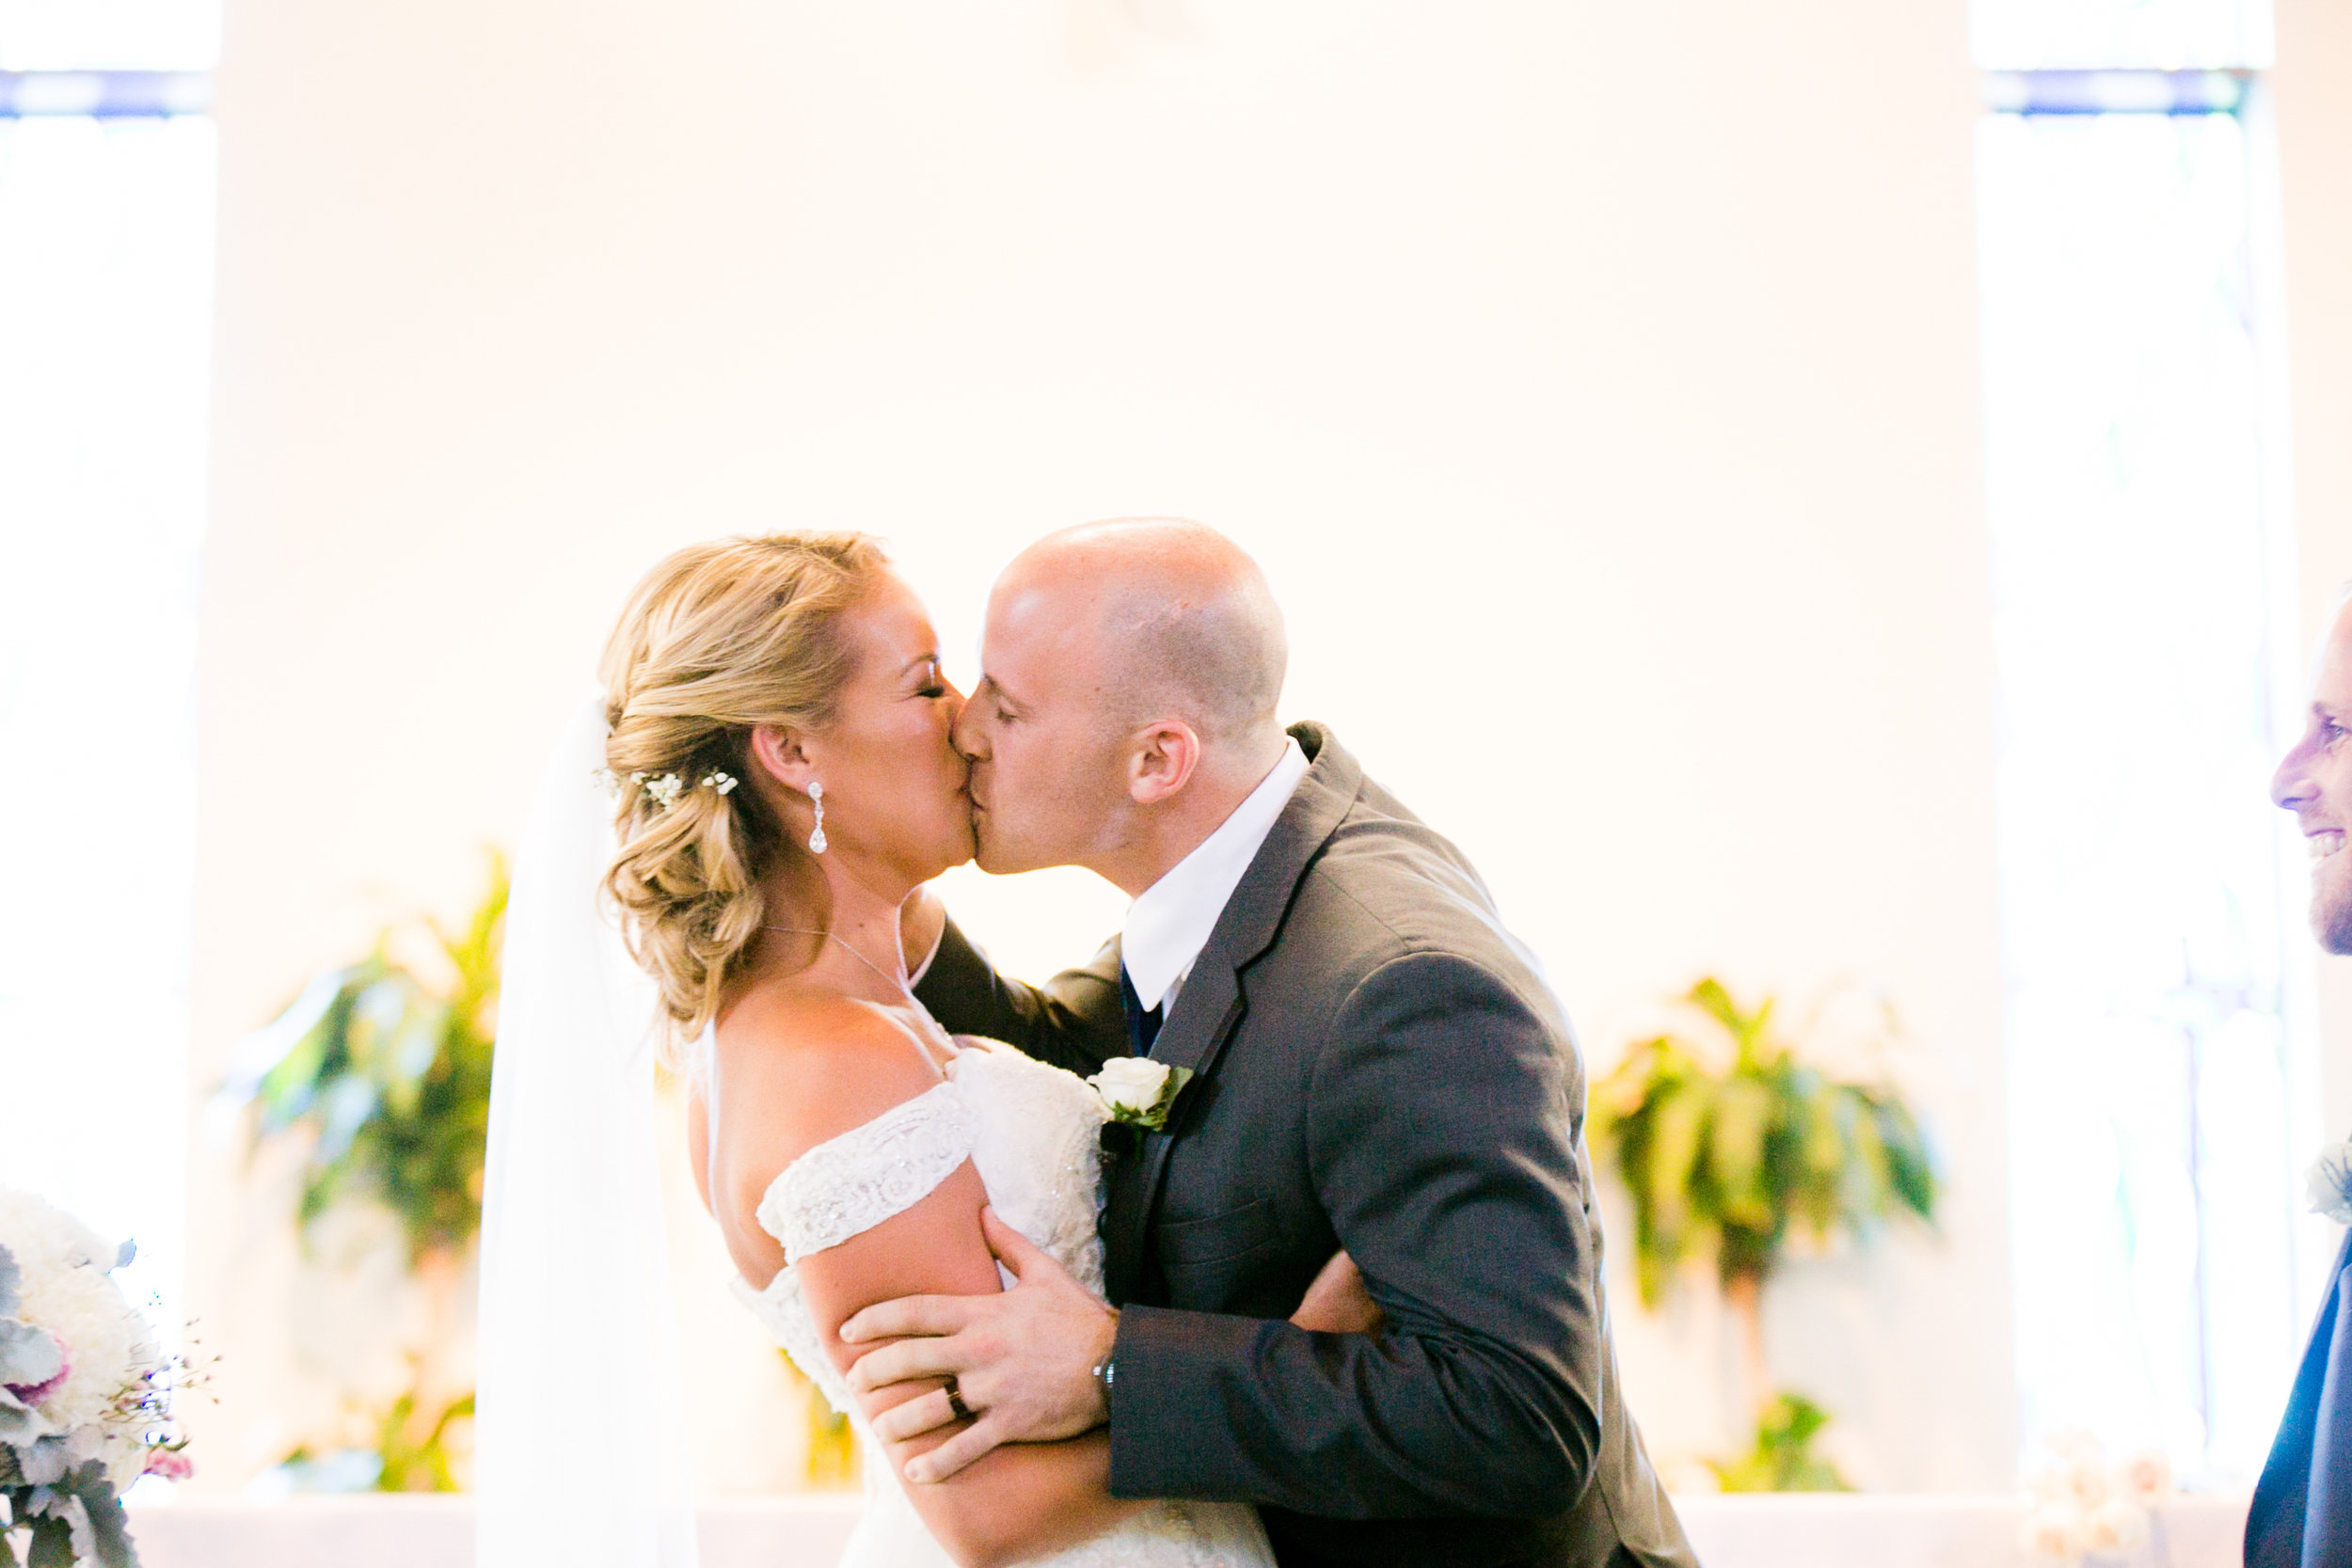 ICONA GOLDEN INN AVALON NJ WEDDING PHOTOGRAPHY  - 050.jpg